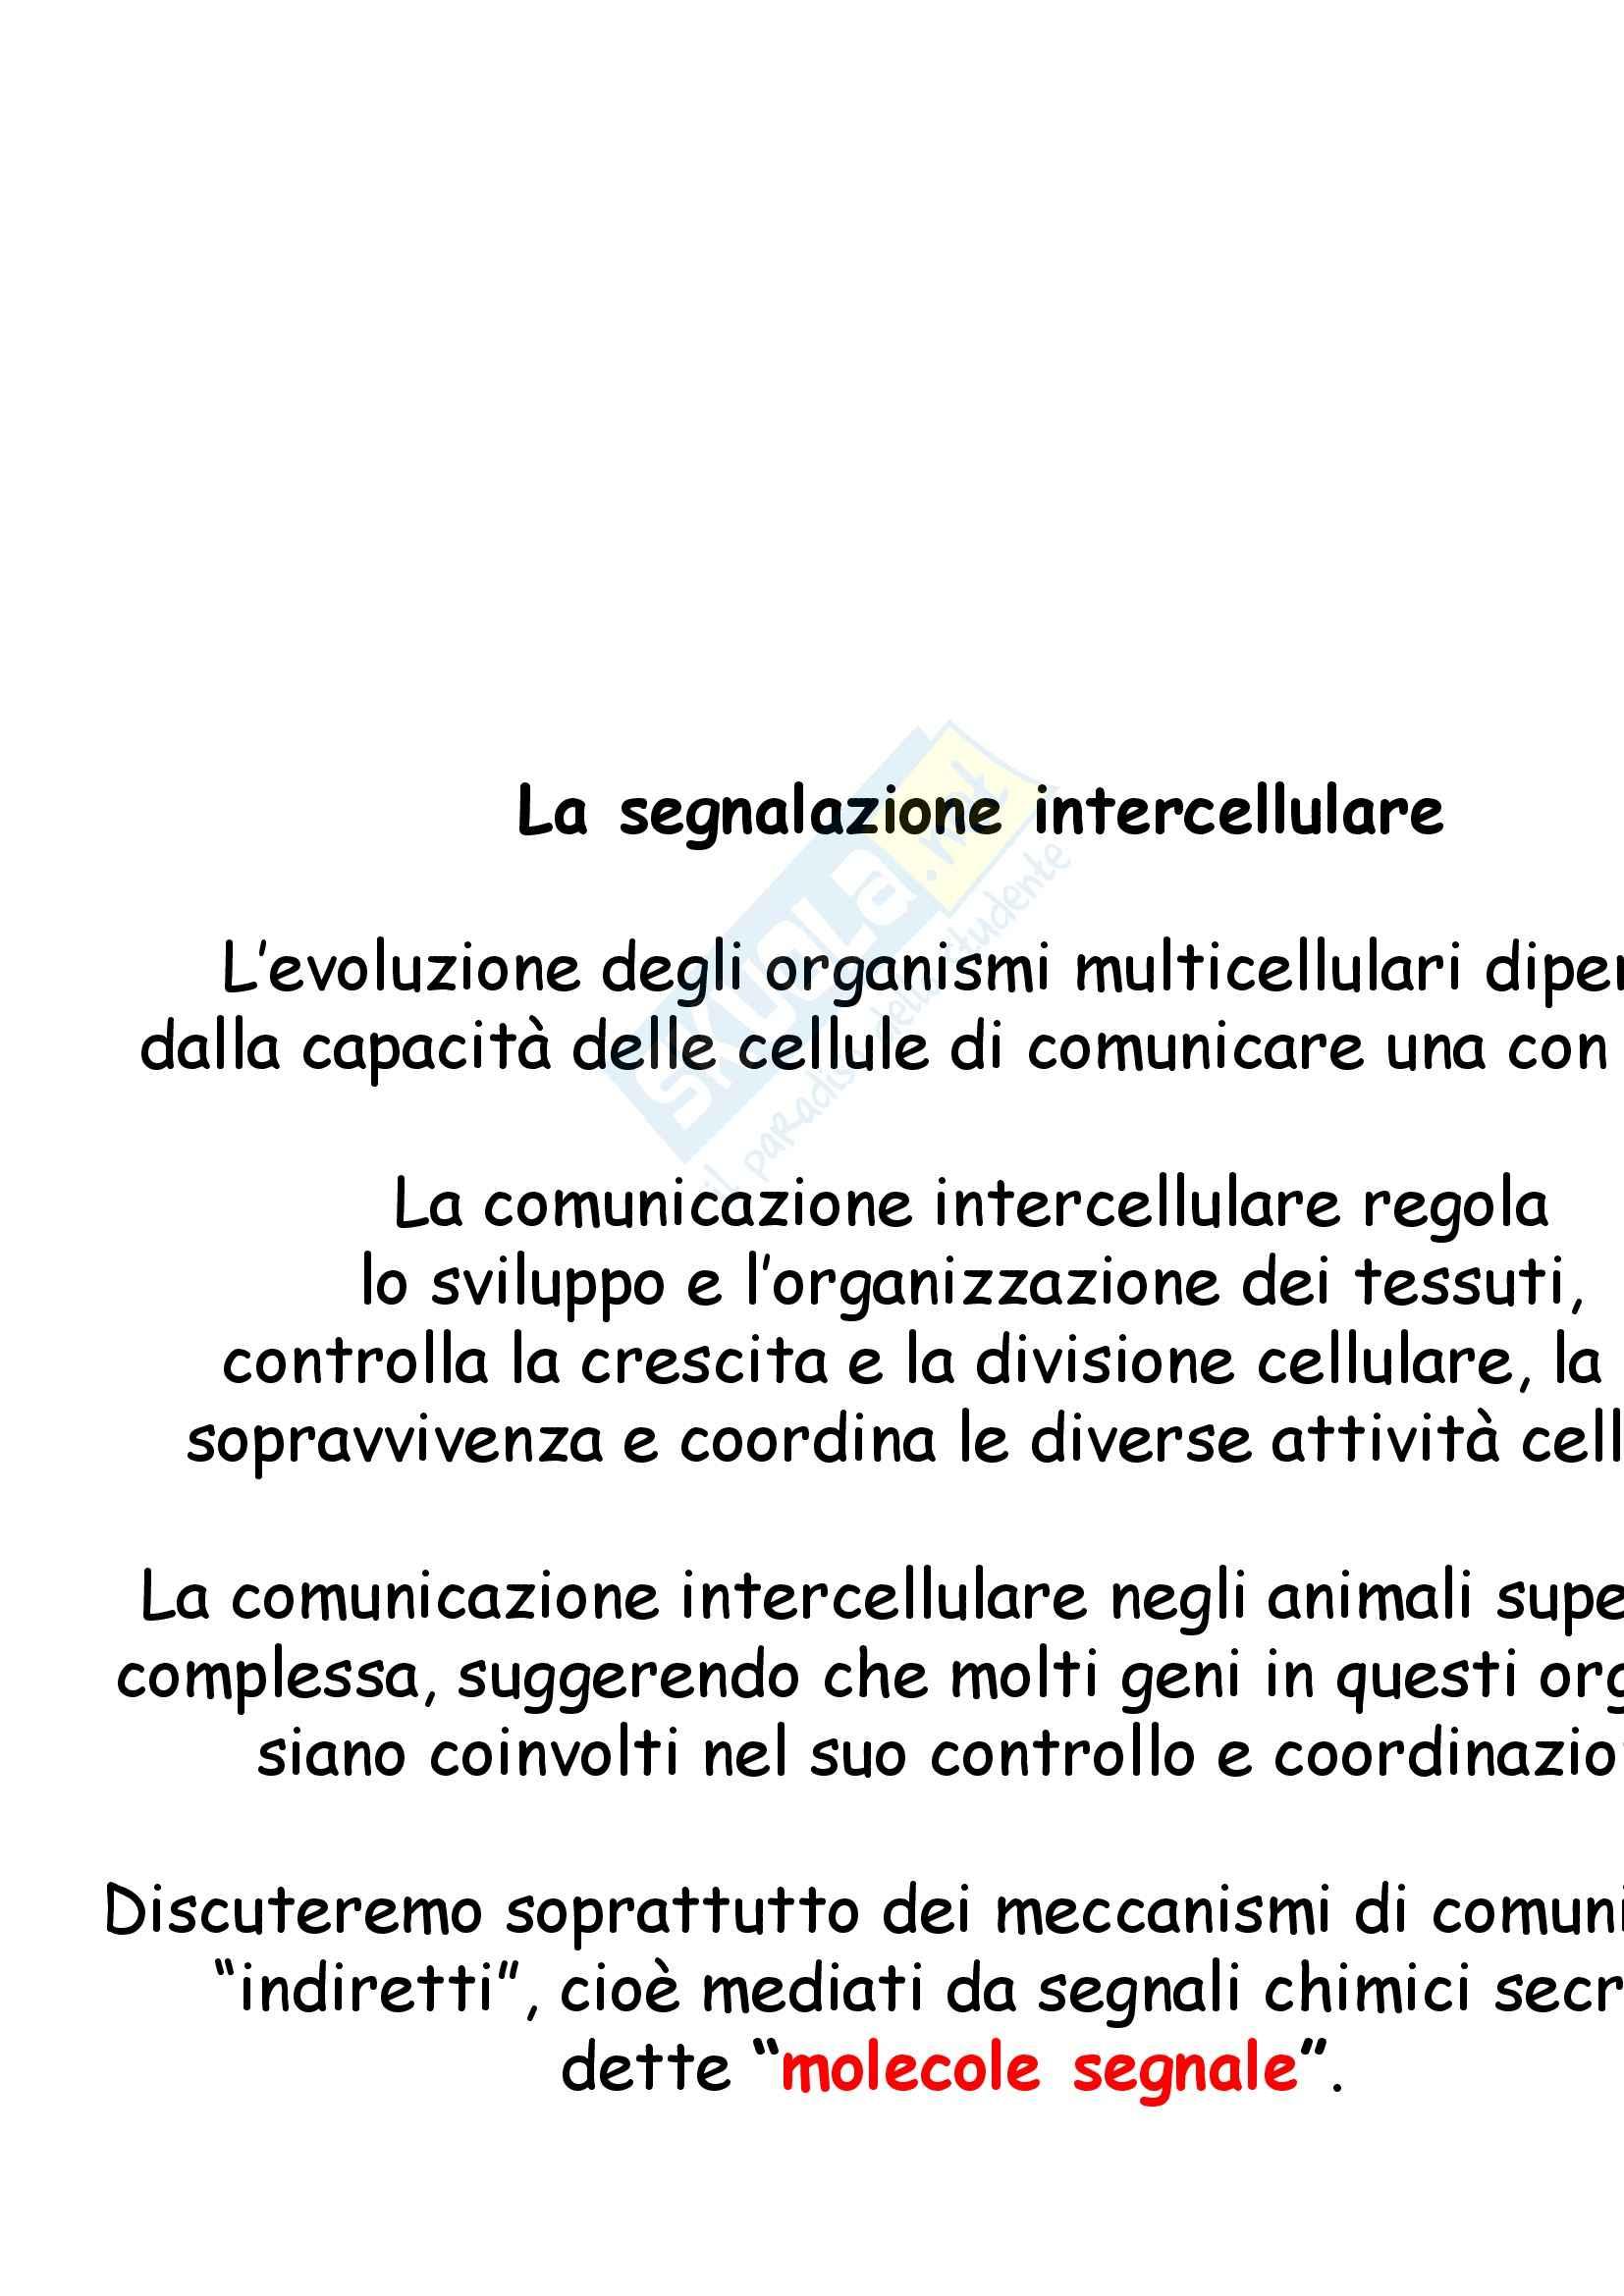 appunto P. De Filippi Biologia cellulare